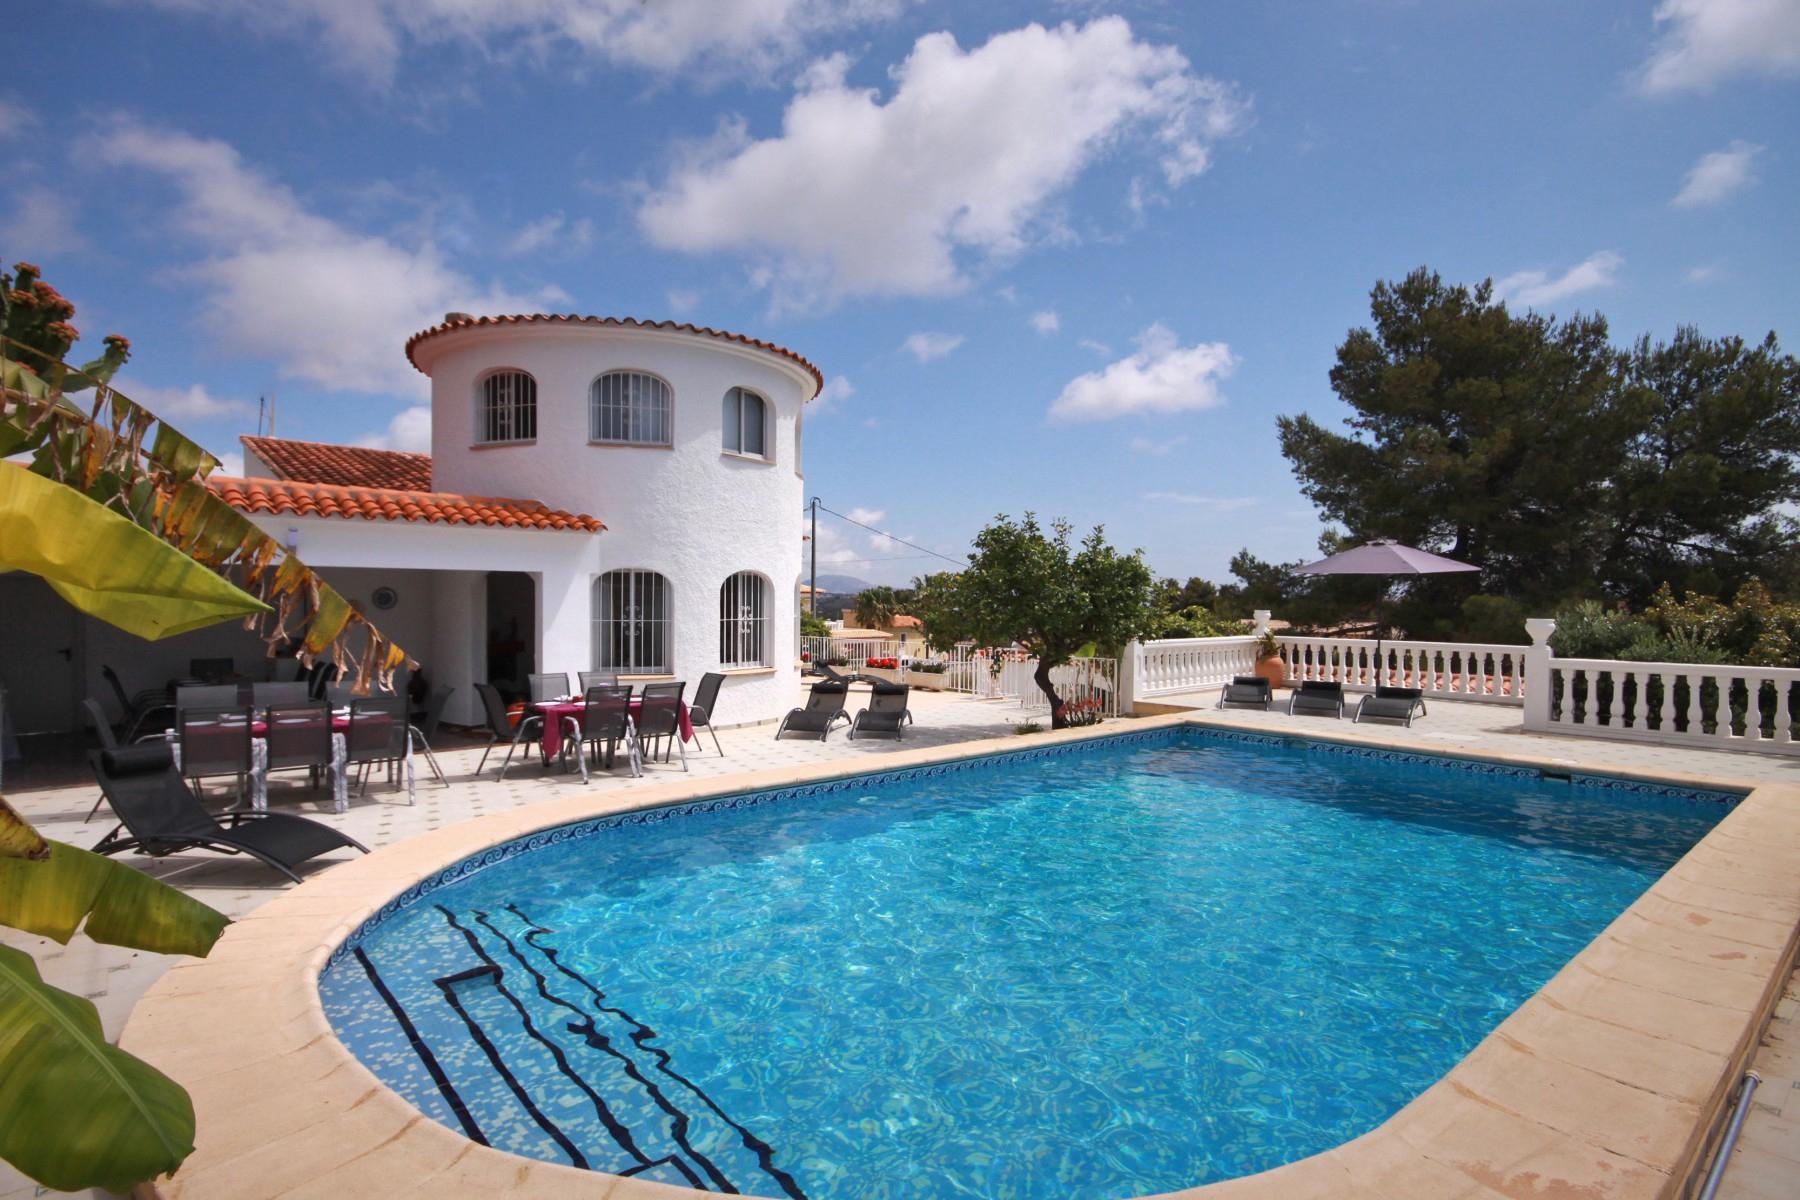 Costa Blanca Location Villa Calpe Avec Piscine Privée serapportantà Location Villa Calpe Avec Piscine